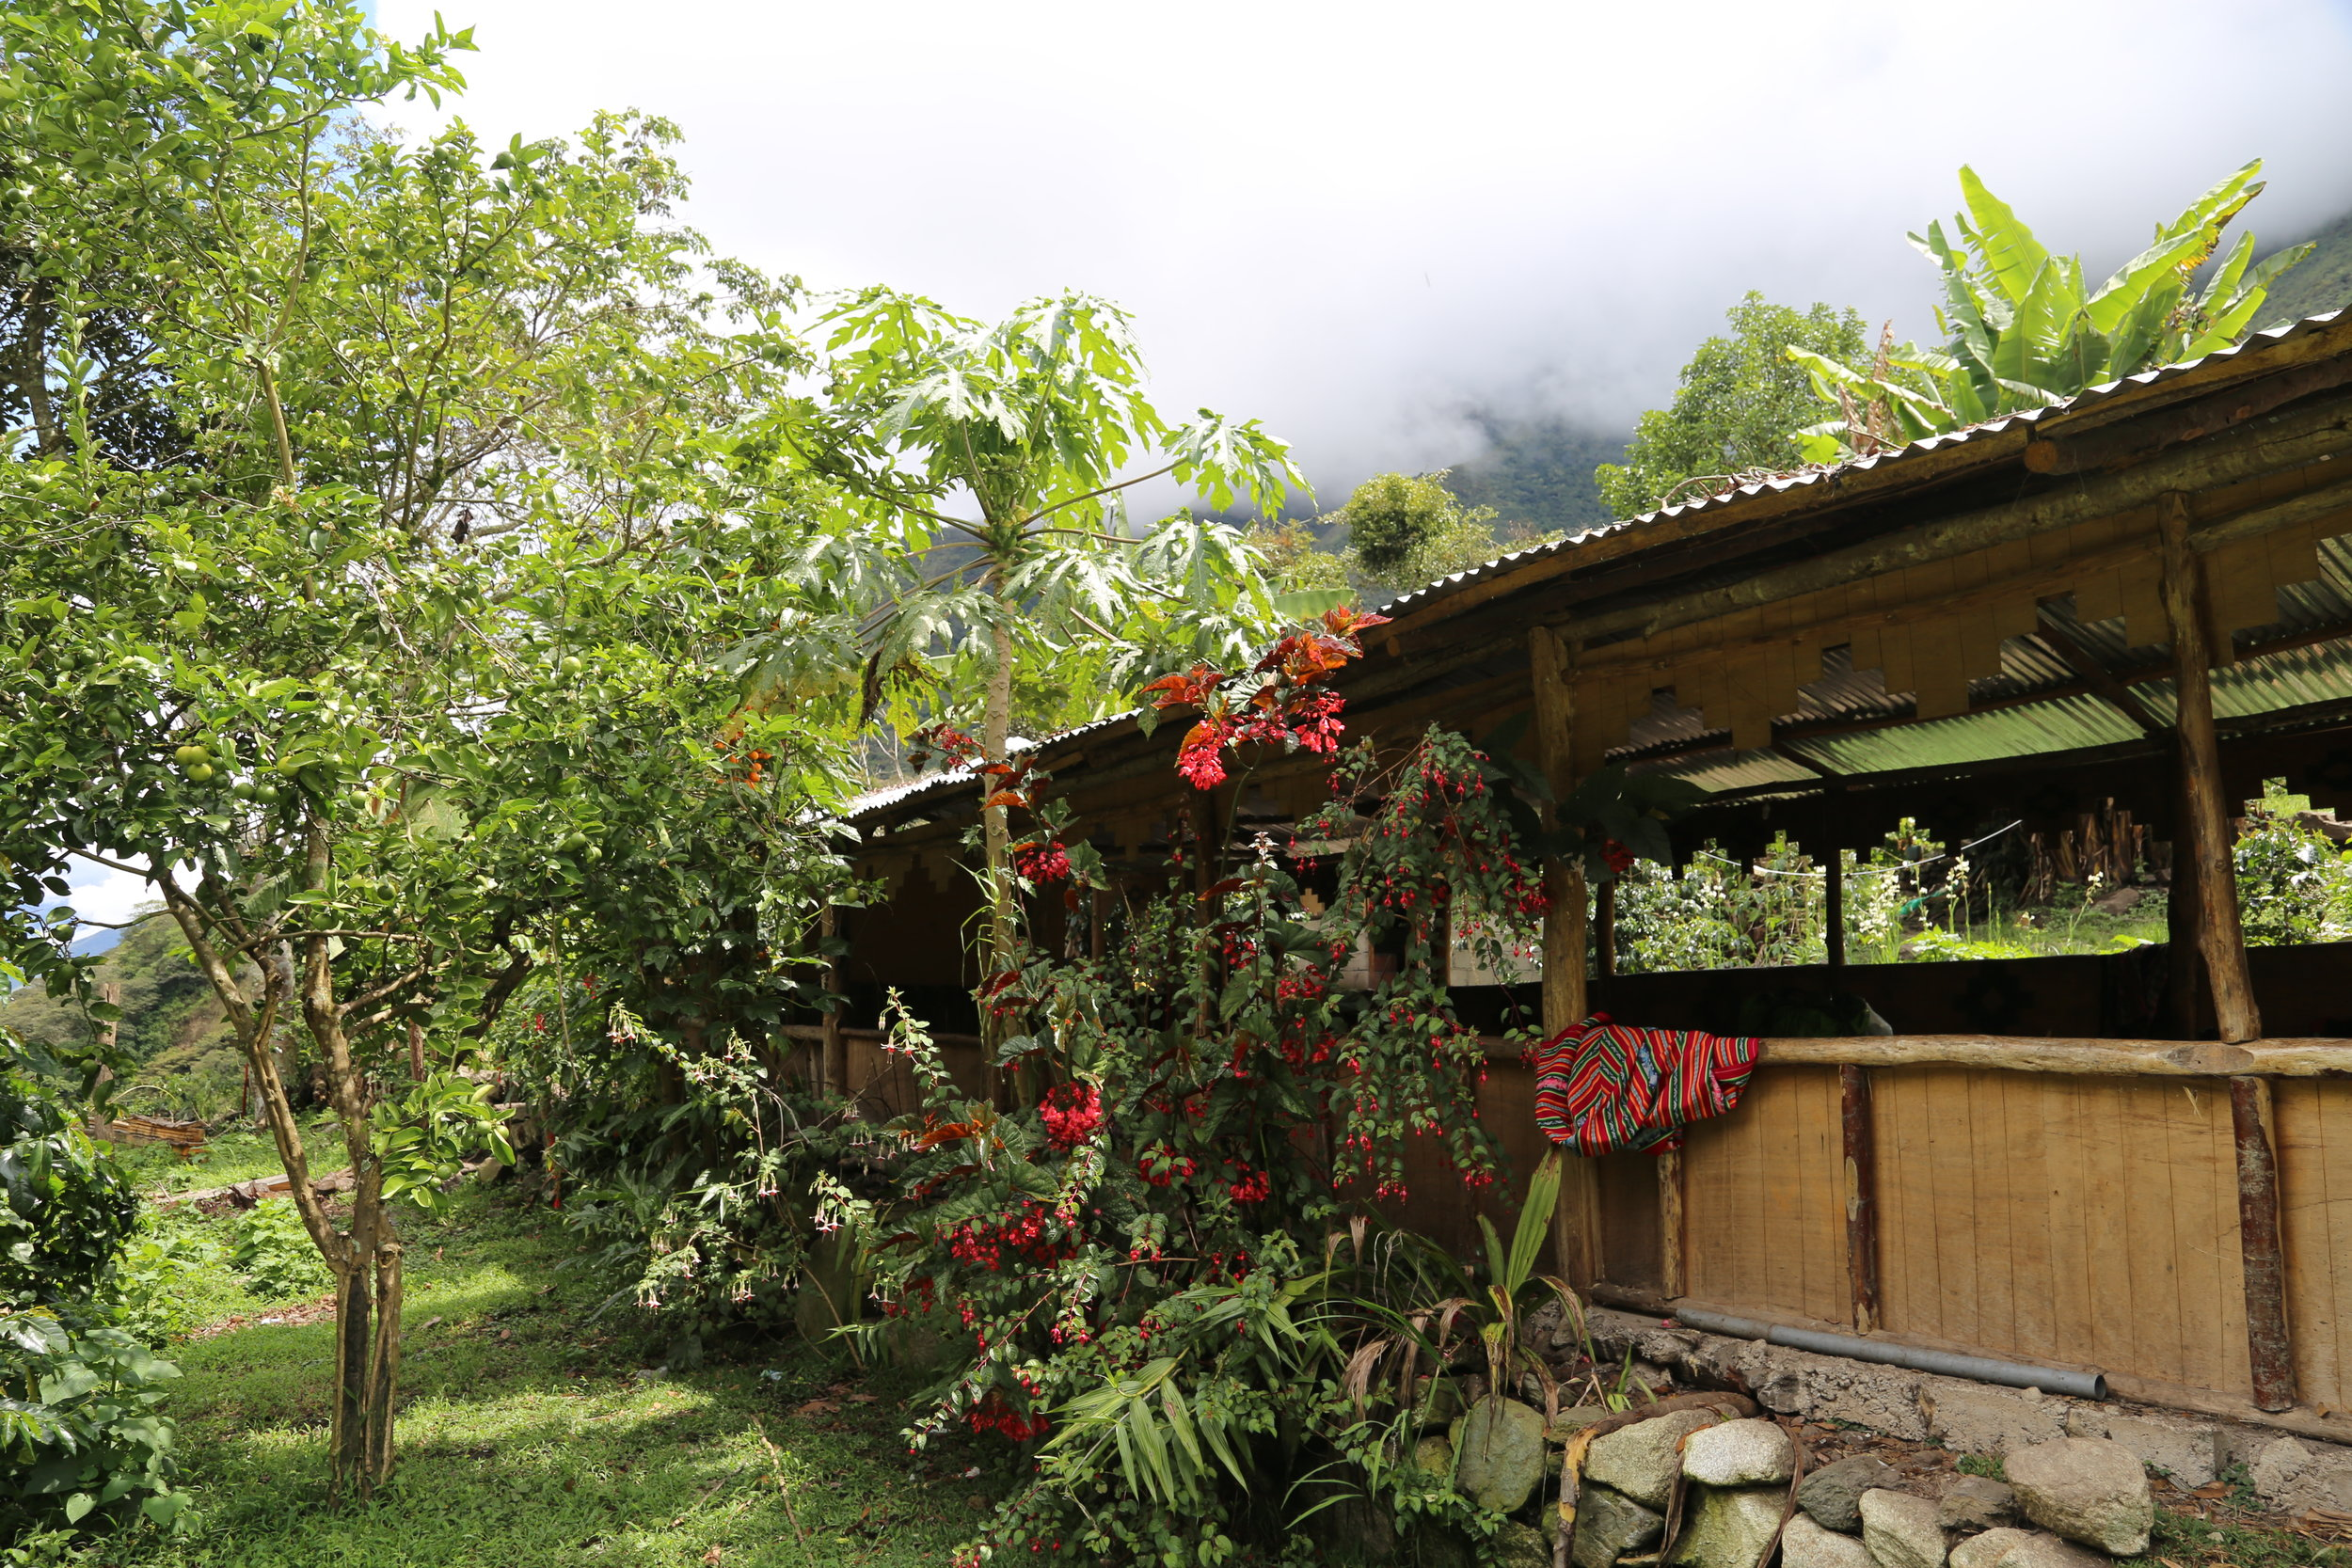 Lunch spot on day 3 of Salkantay Trek to Machu Picchu.